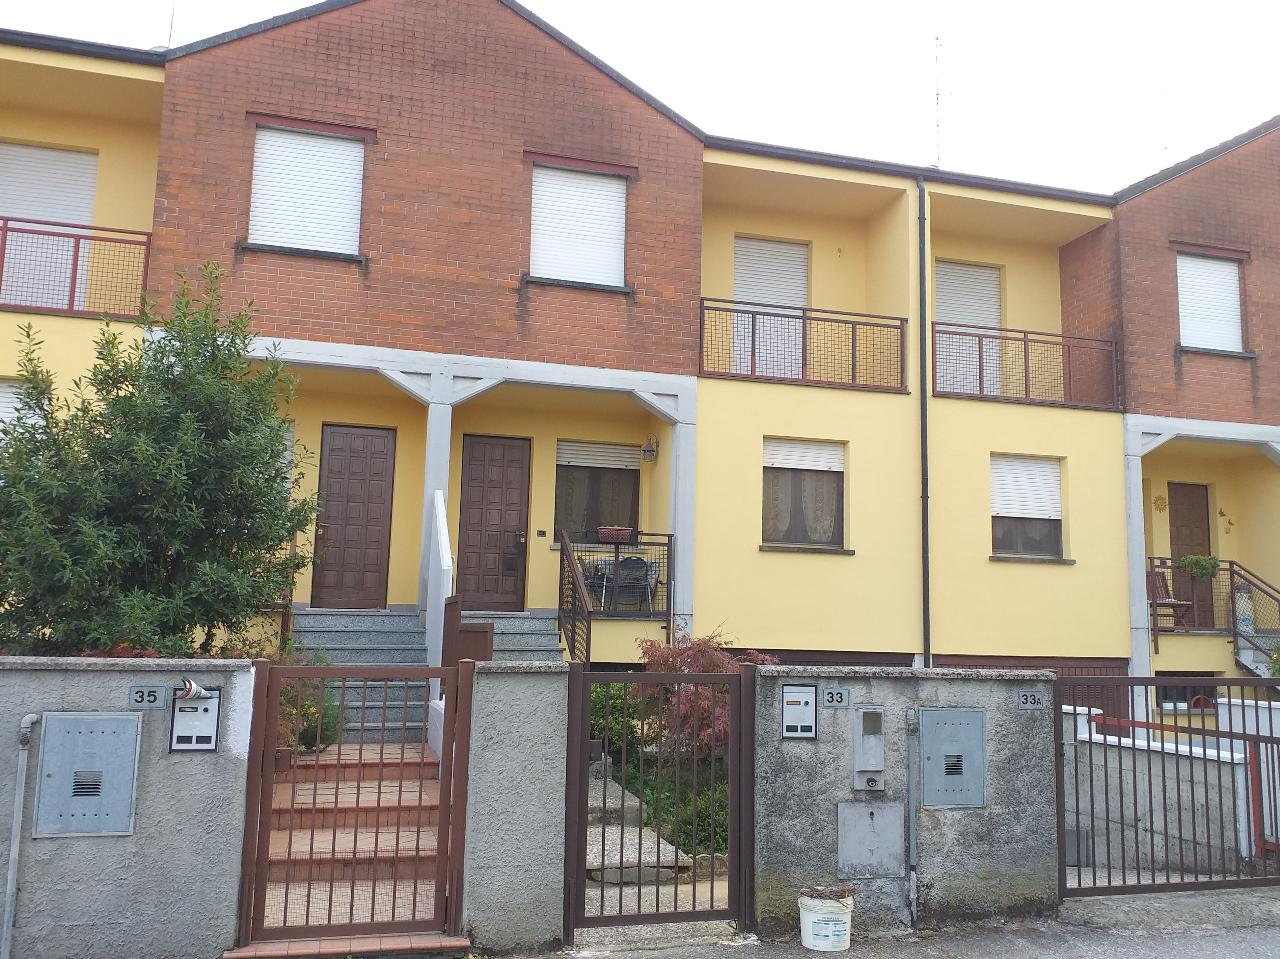 Villa a schiera CREMONA Euro 149.000,00